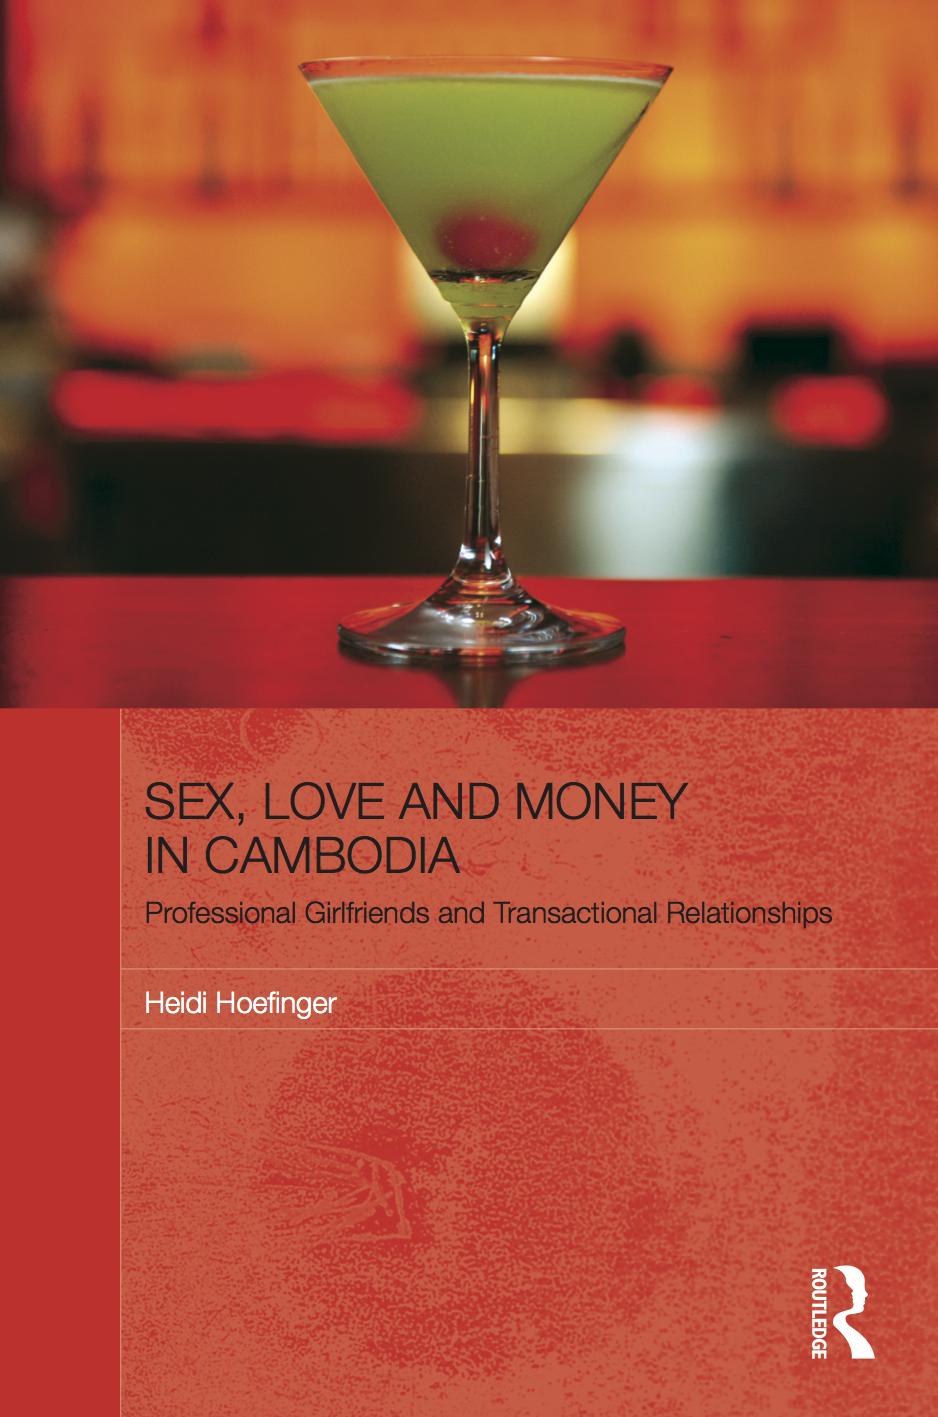 2013-10-11-SexLoveandMoneyFINALCOVER.jpg